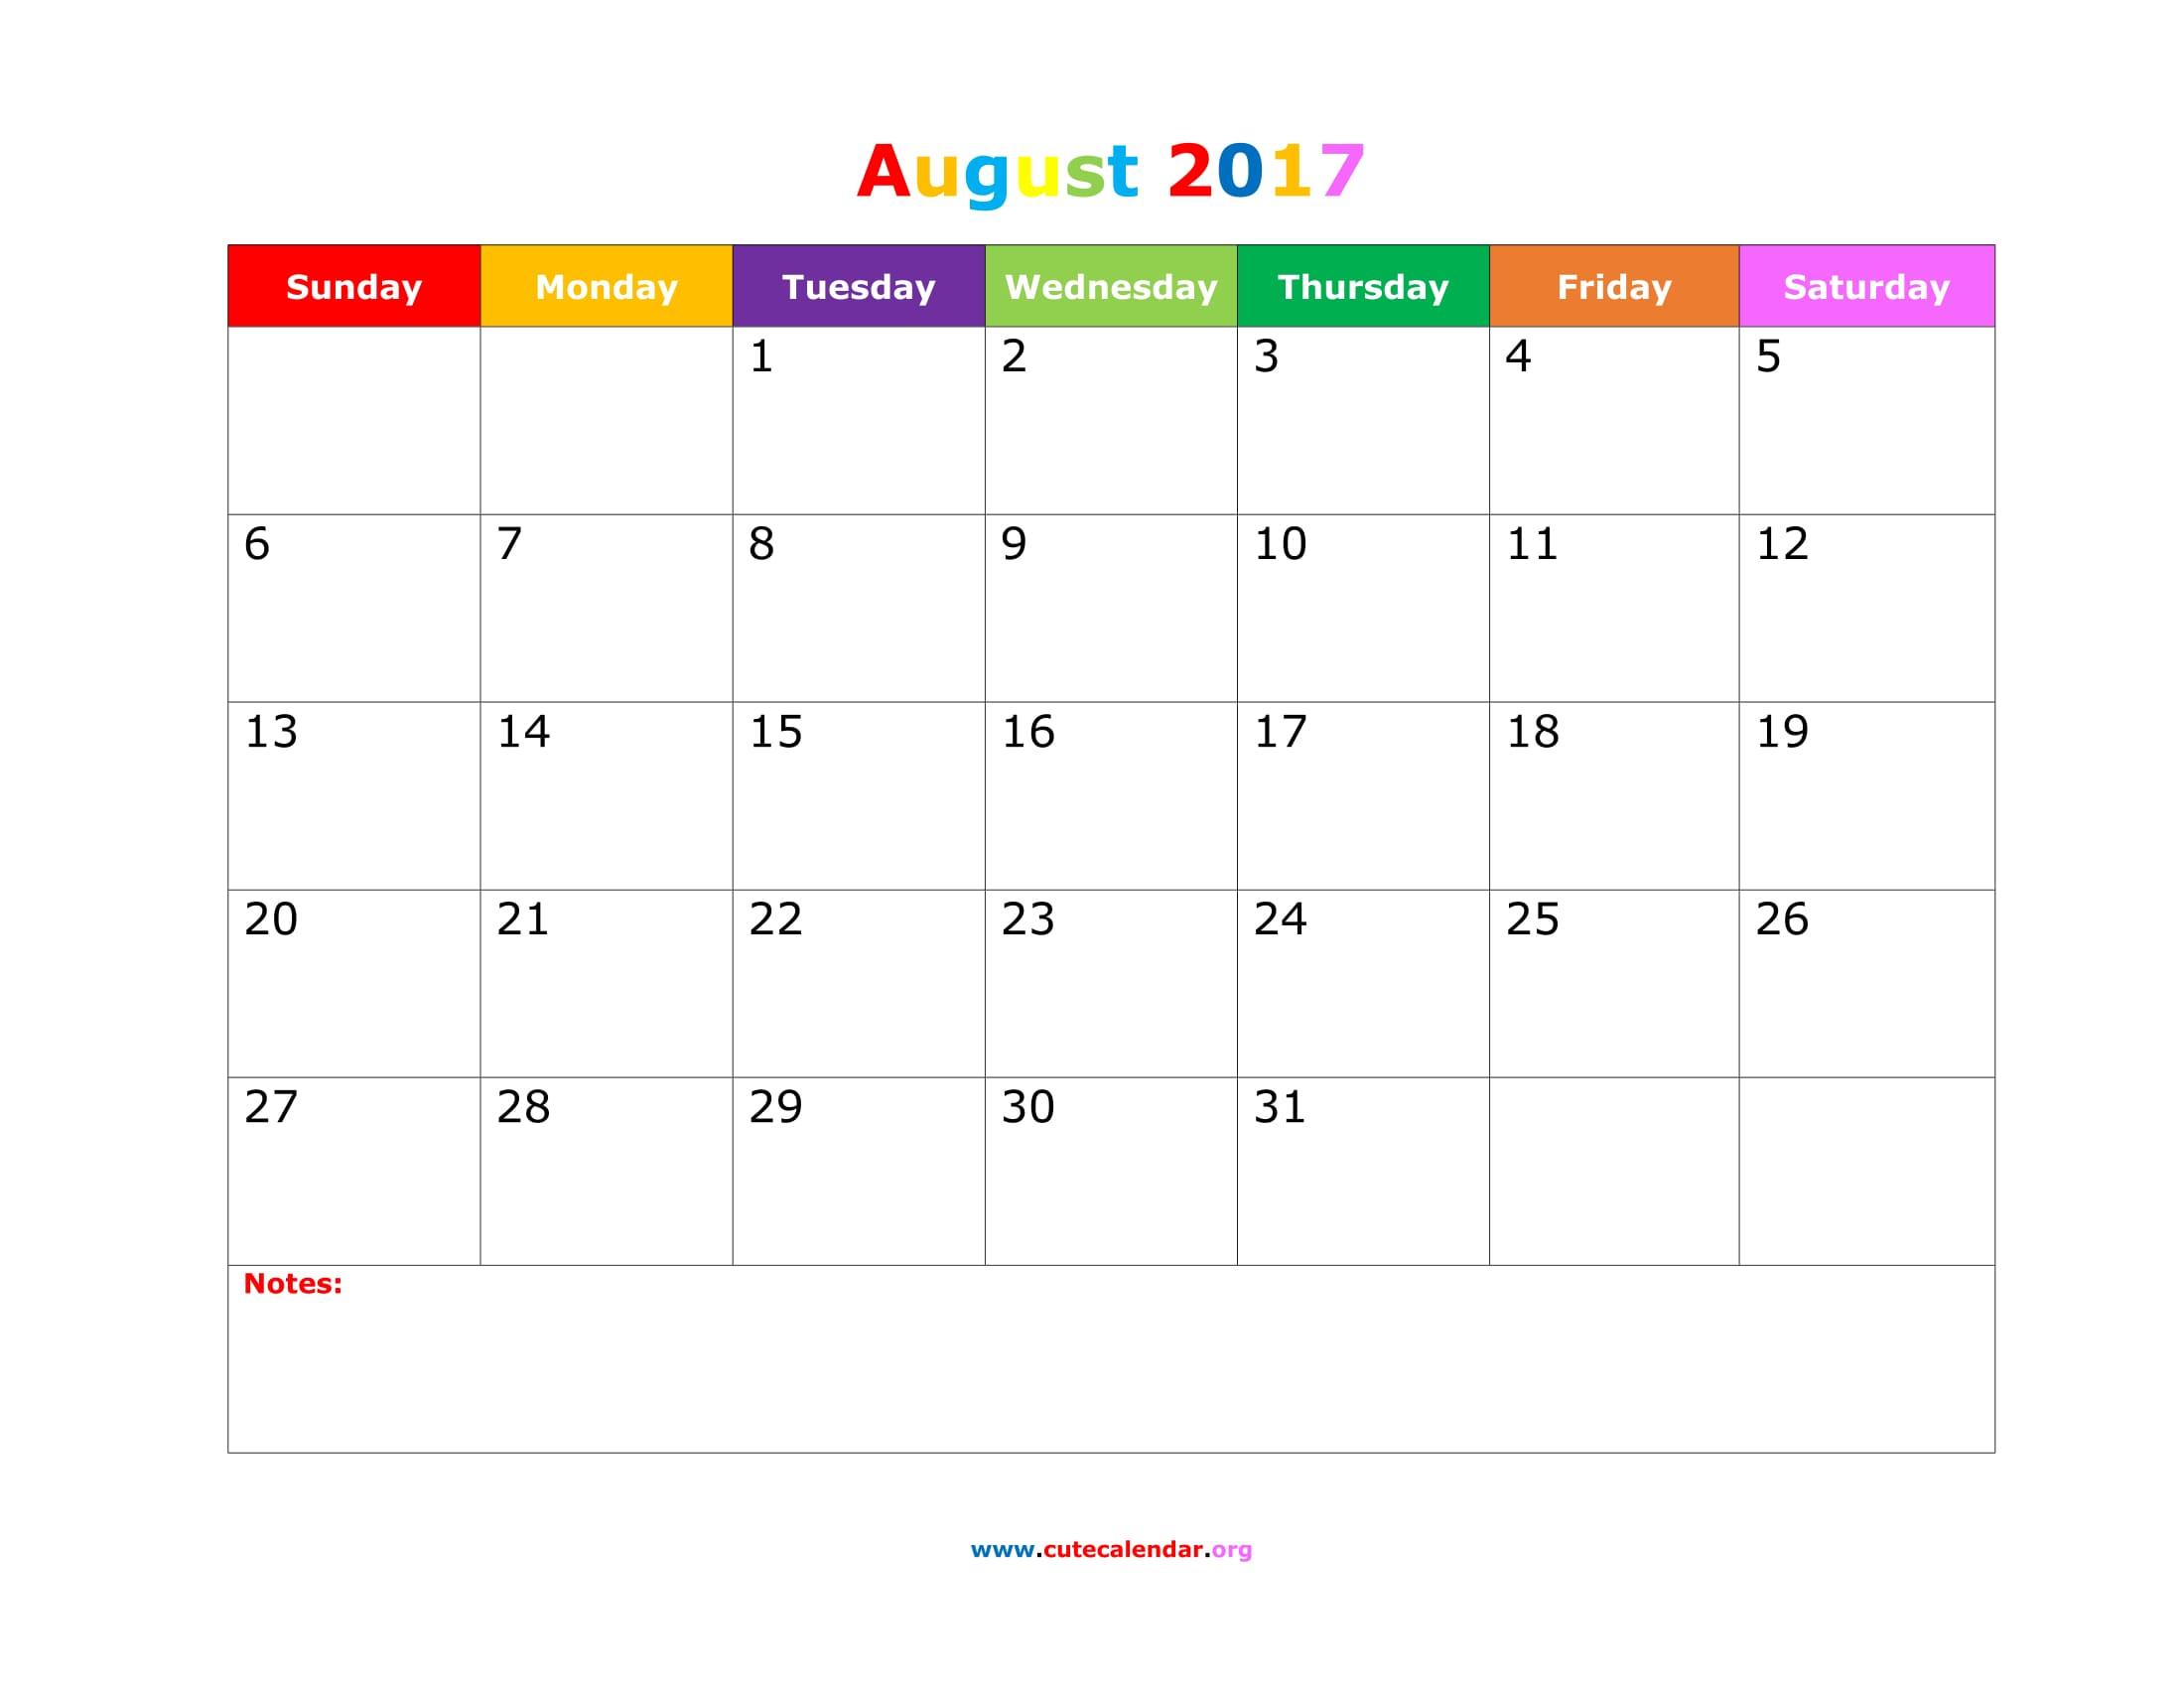 August 2017 Calendar Cute | blank calendar printable